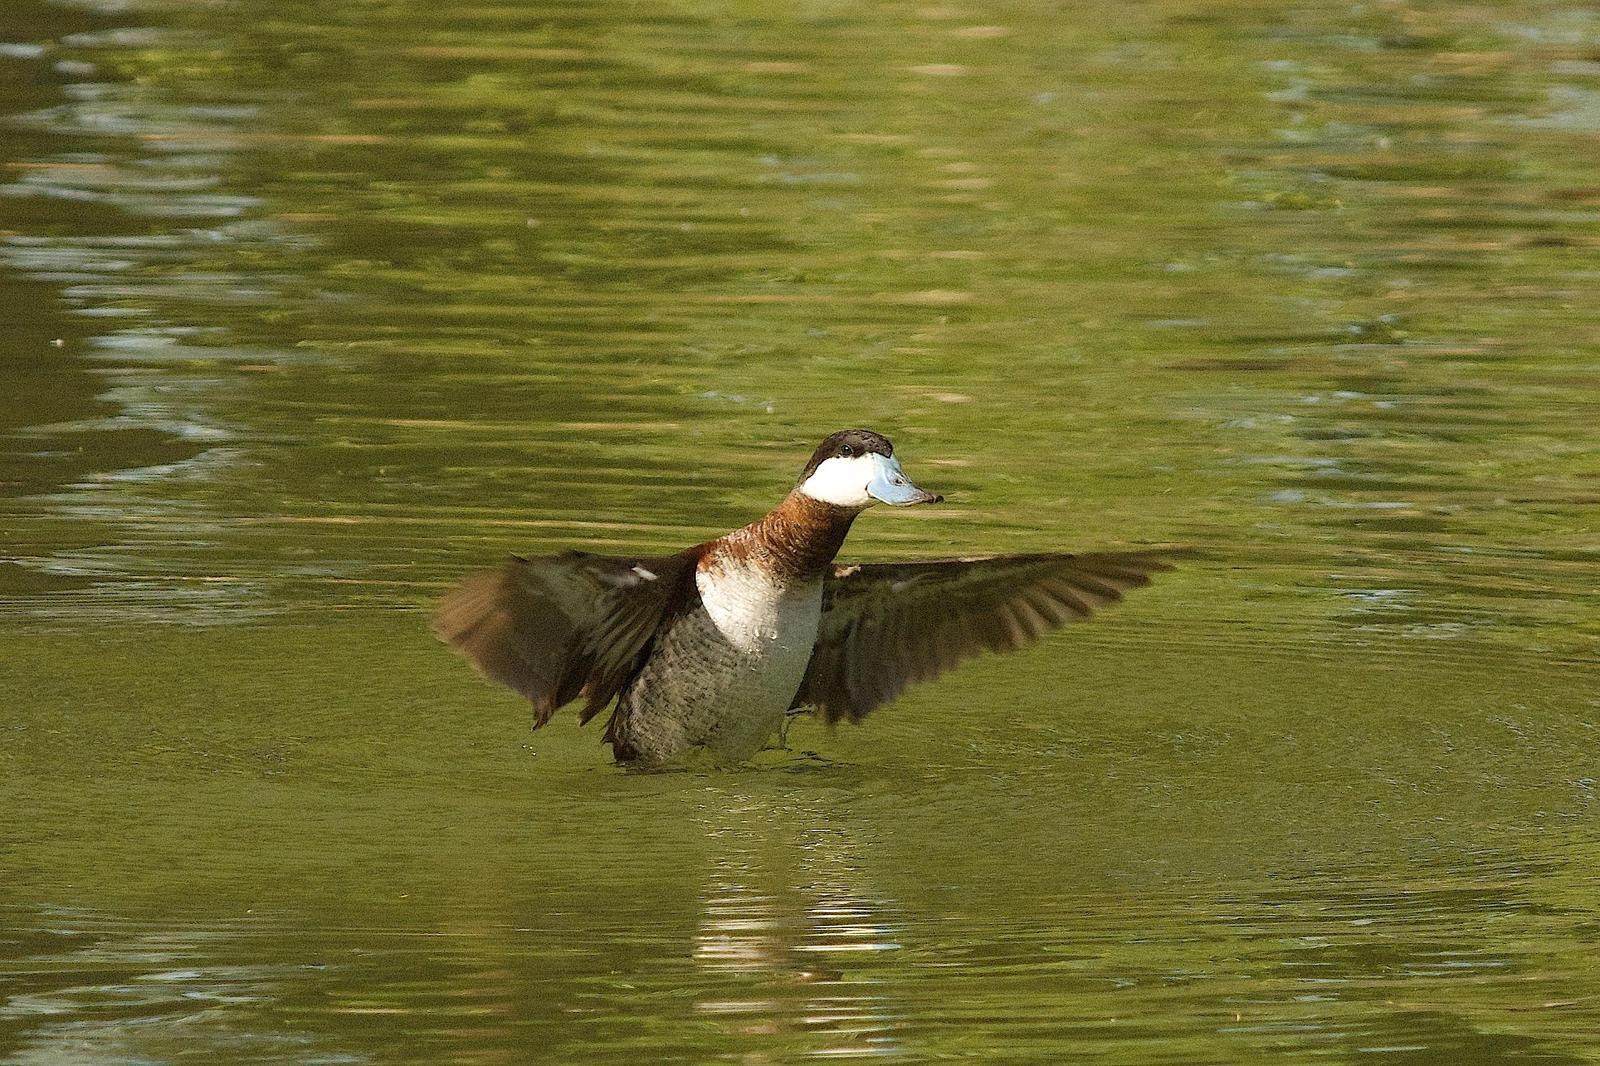 Ruddy Duck Photo by Gerald Hoekstra